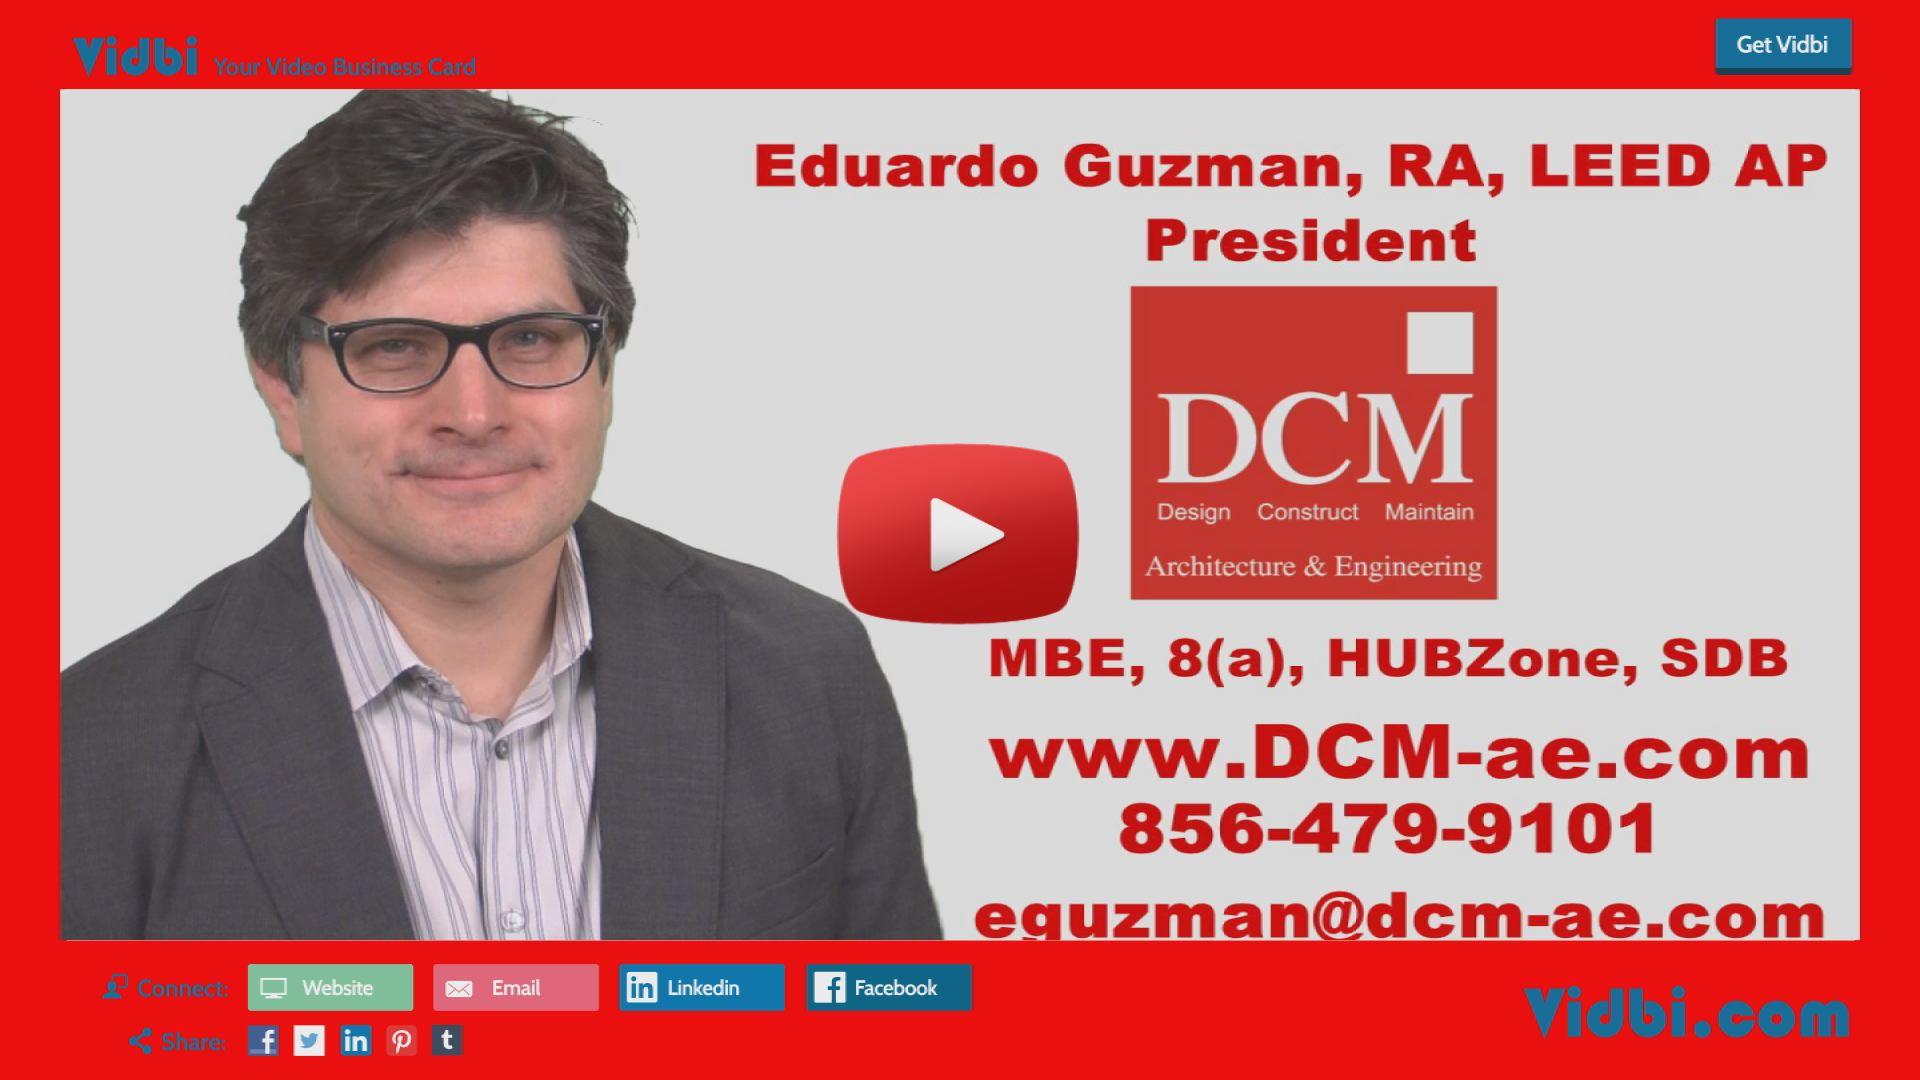 Eduardo Guzman - DCM Architecture and Engineering Vidbi